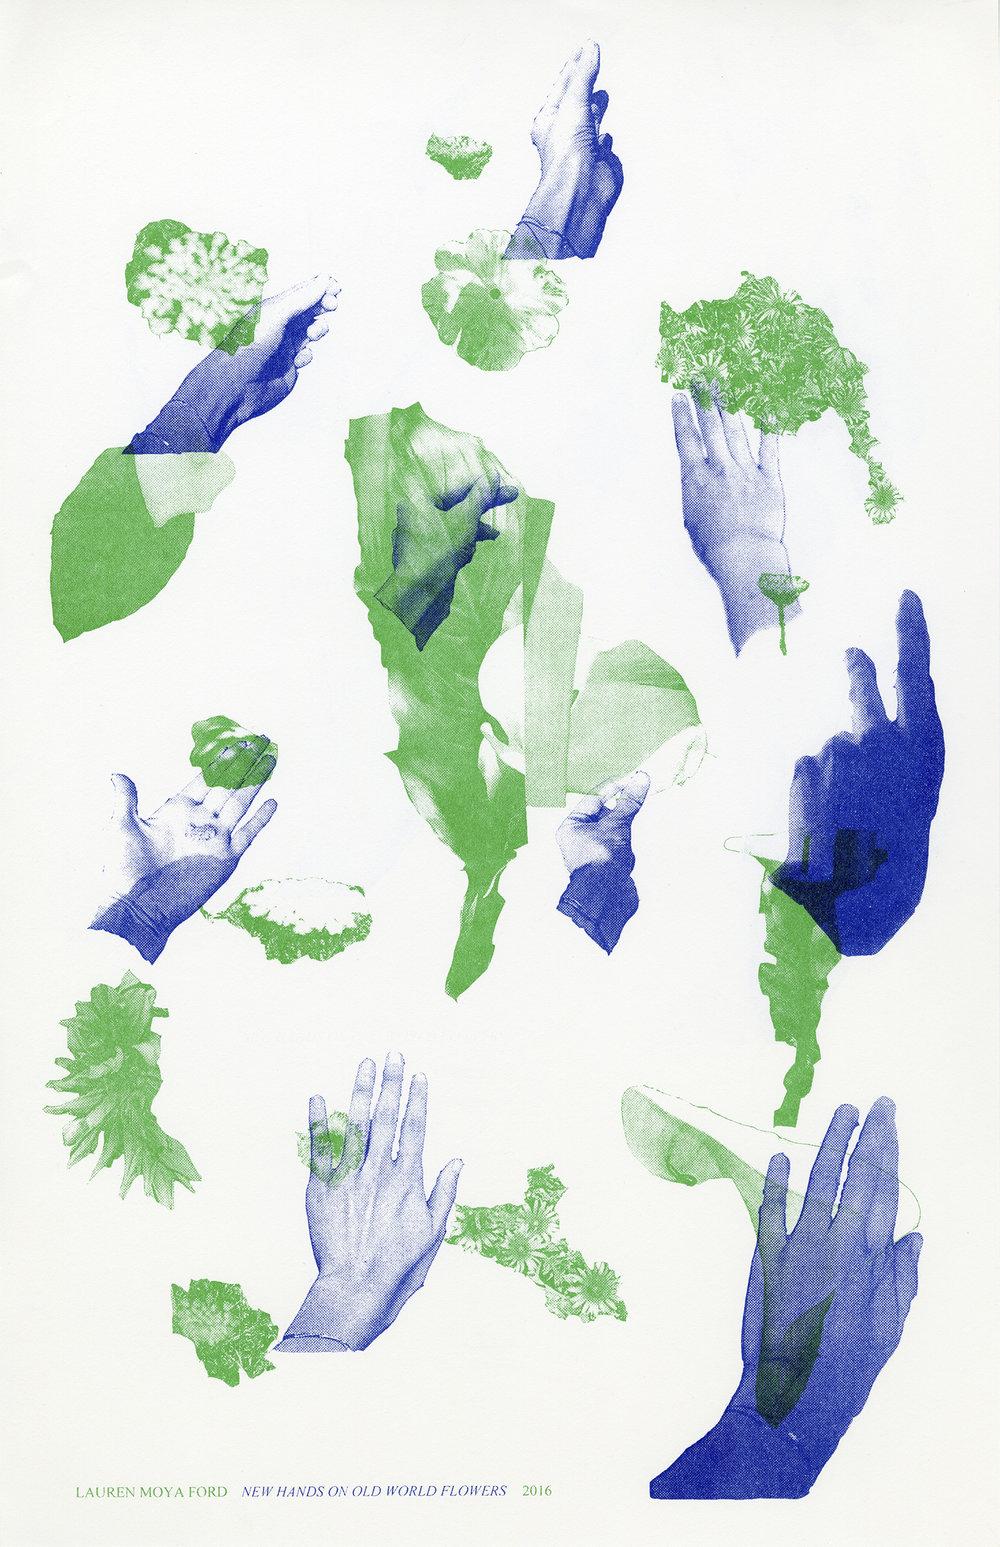 New Hands on Old World Flowers, w/Lauren Moya Ford